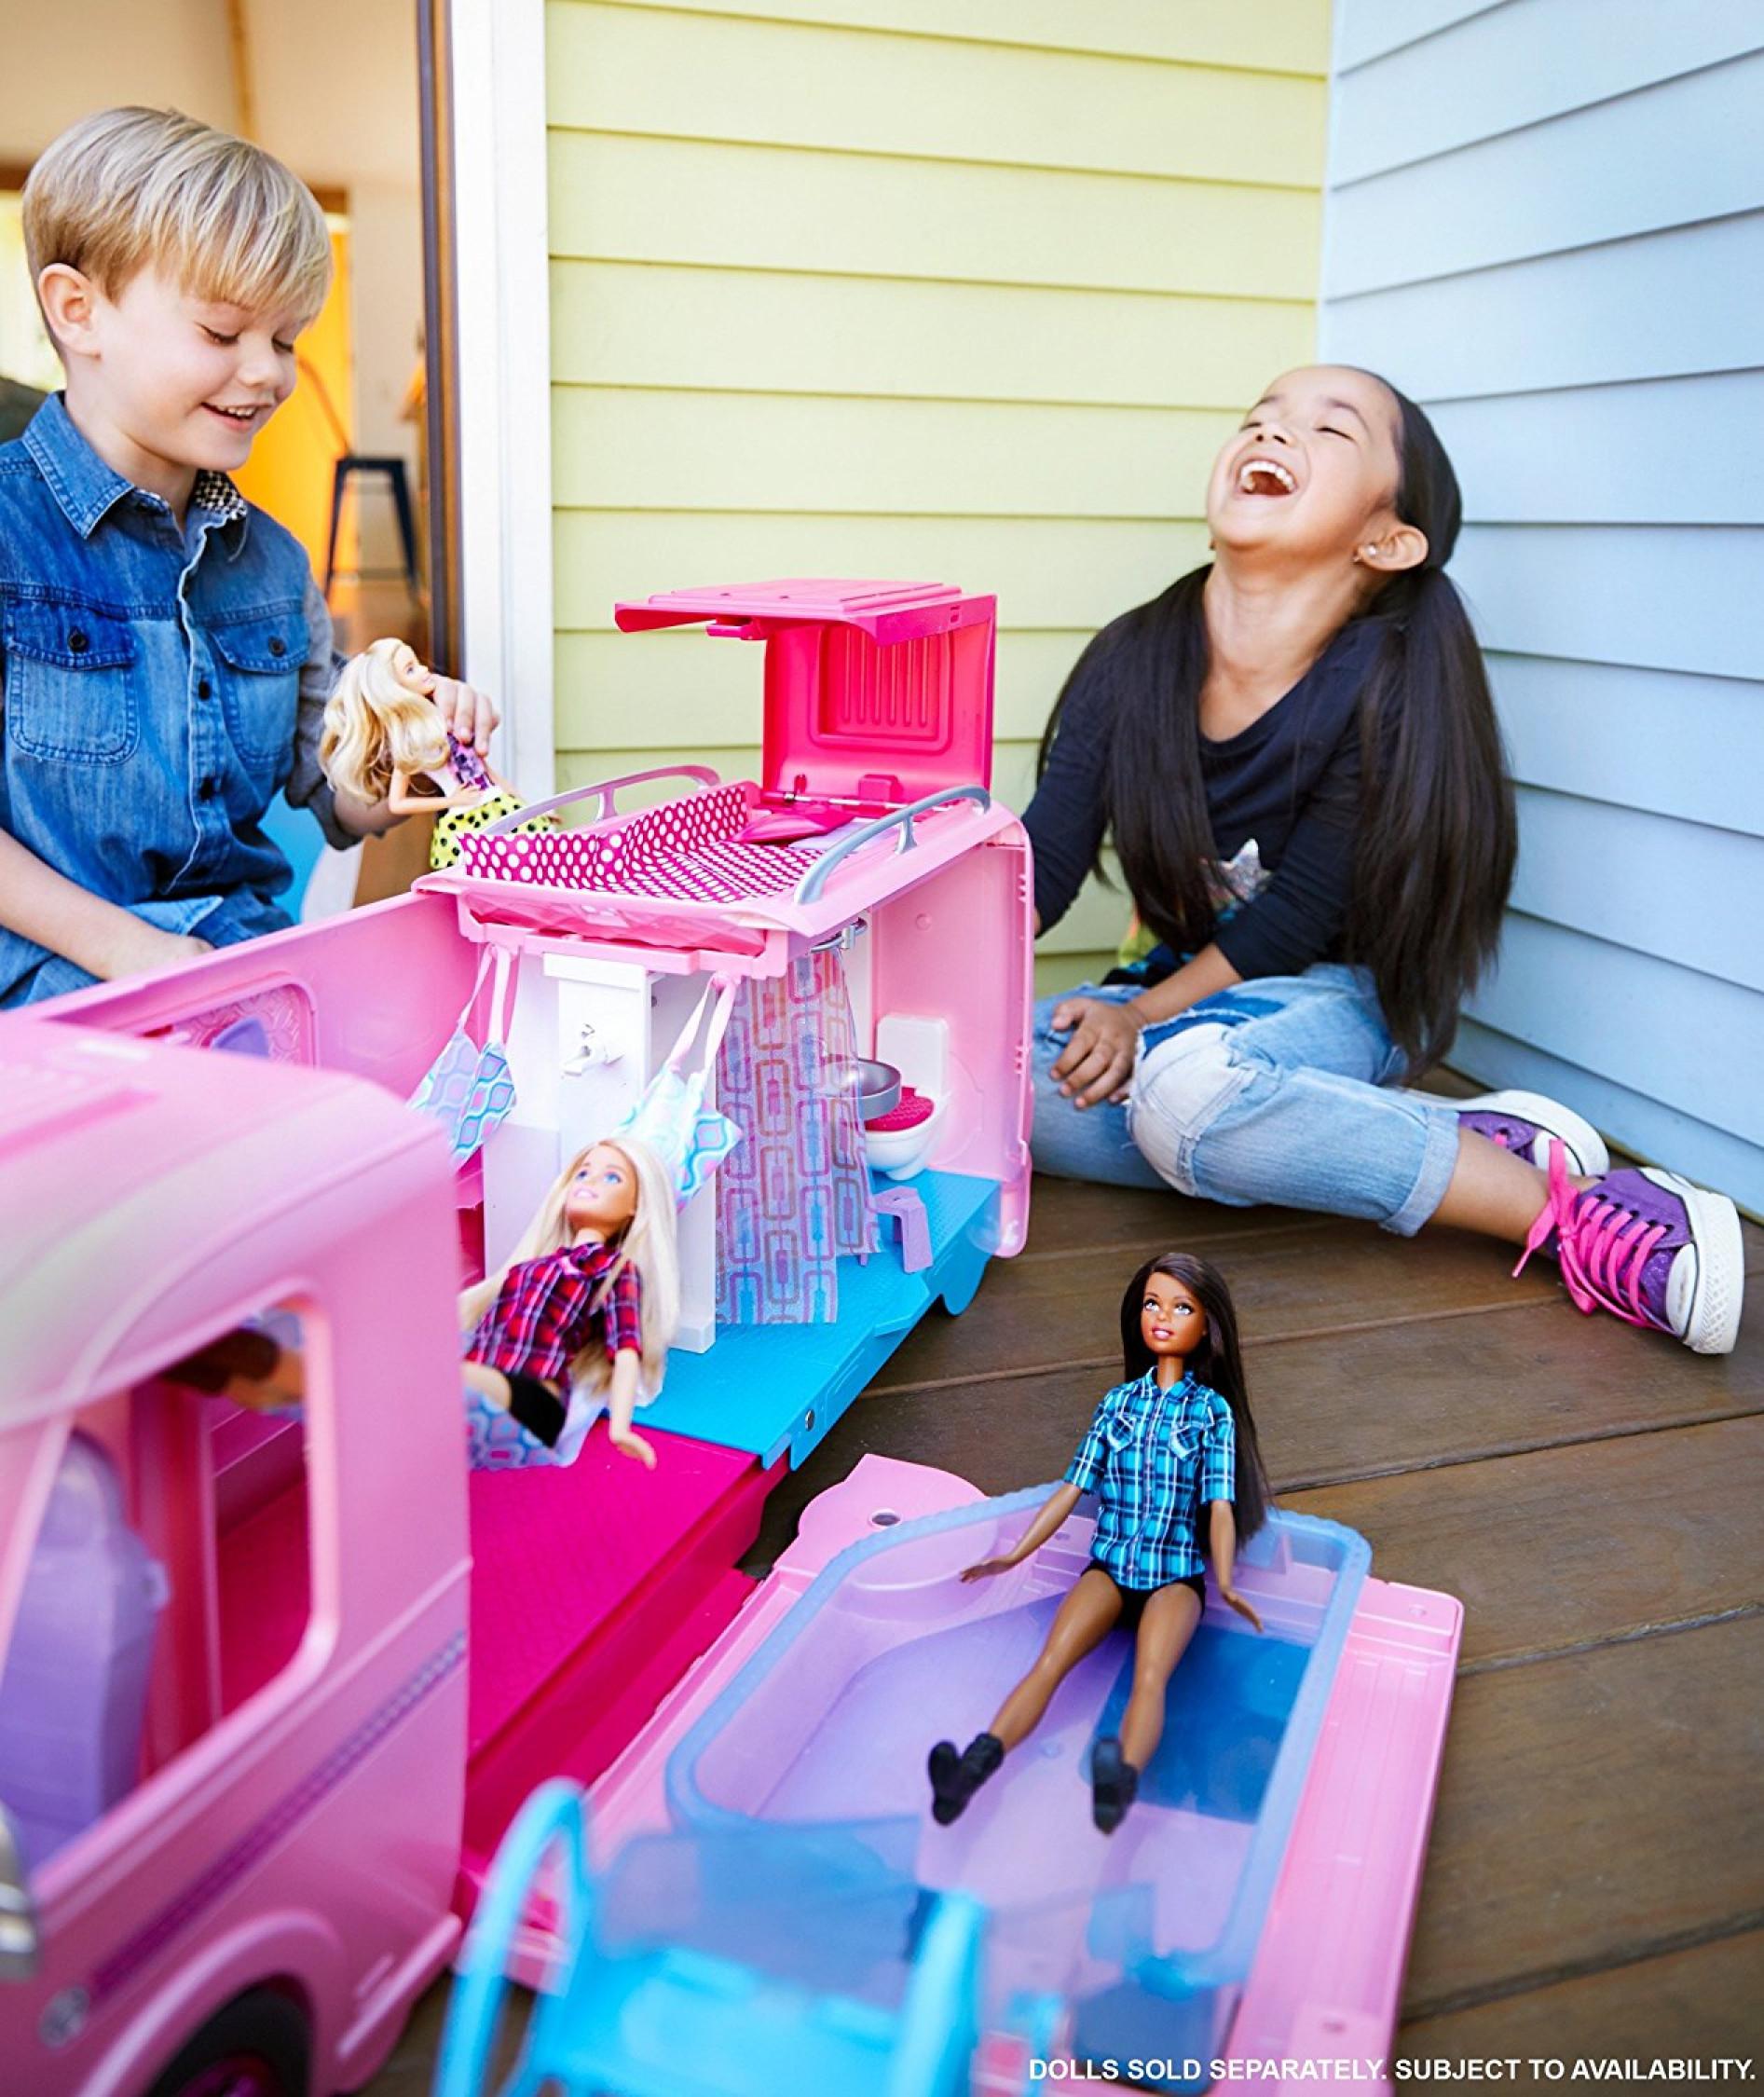 BARBIE FBR34 Camper Van Vehicle Fashion Doll And